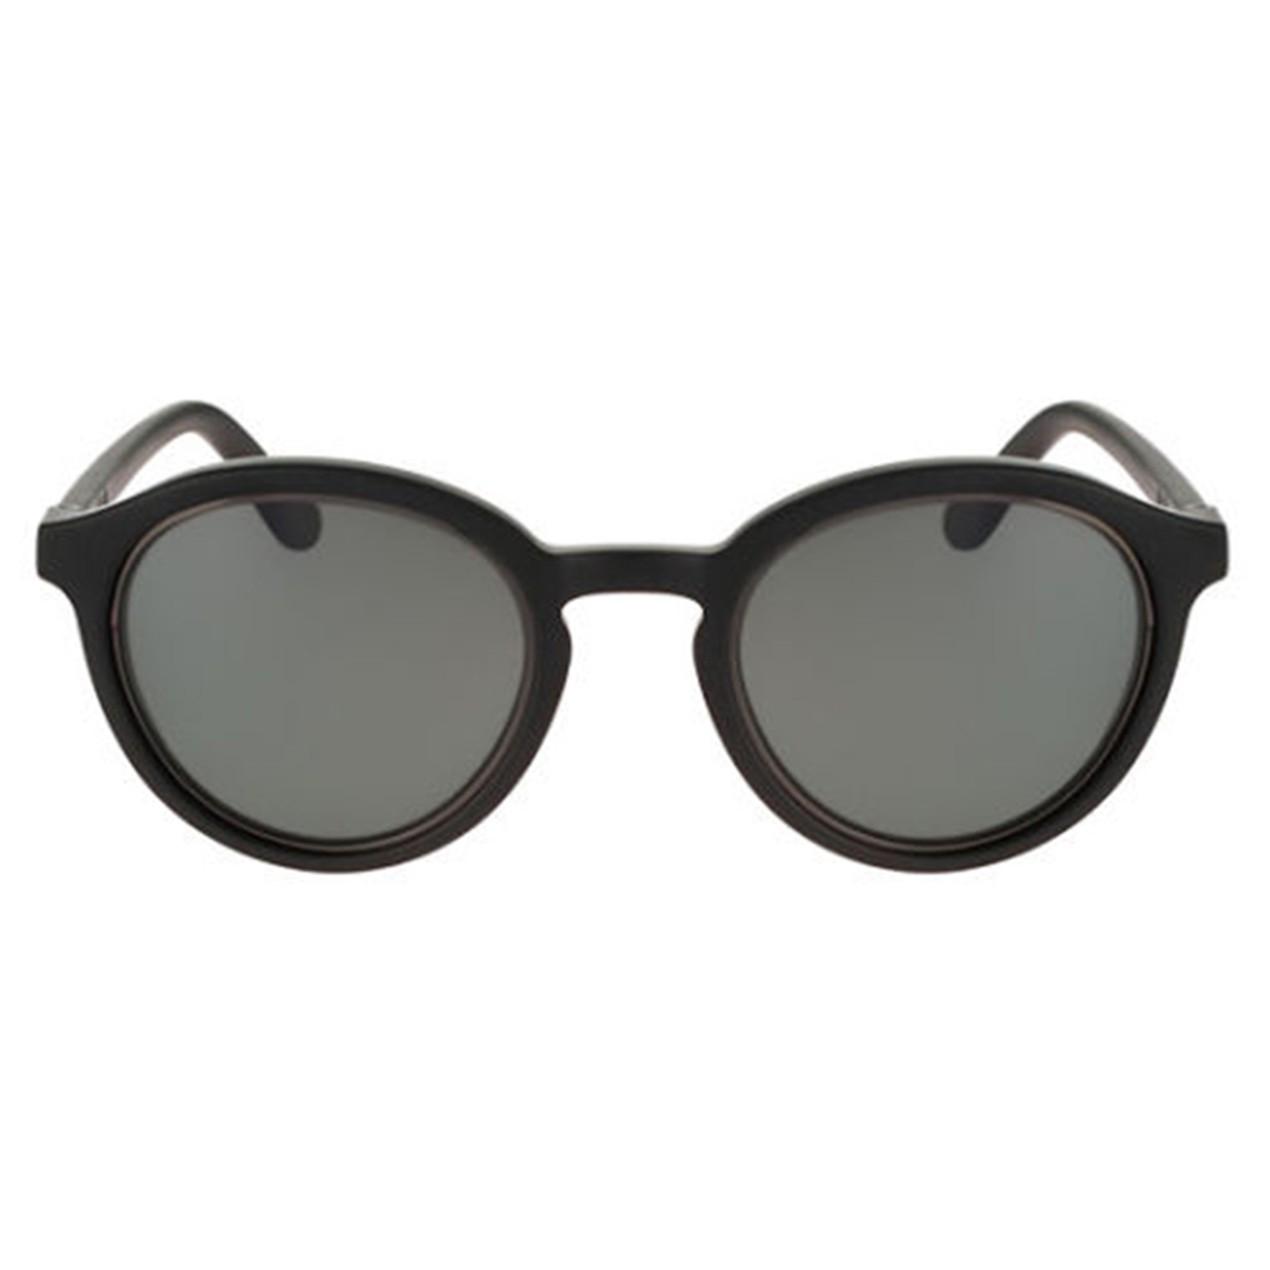 8f10cbfaf9 Calvin Klein Collection Polarized Round Sunglasses CK8503SP 007 - Tanga